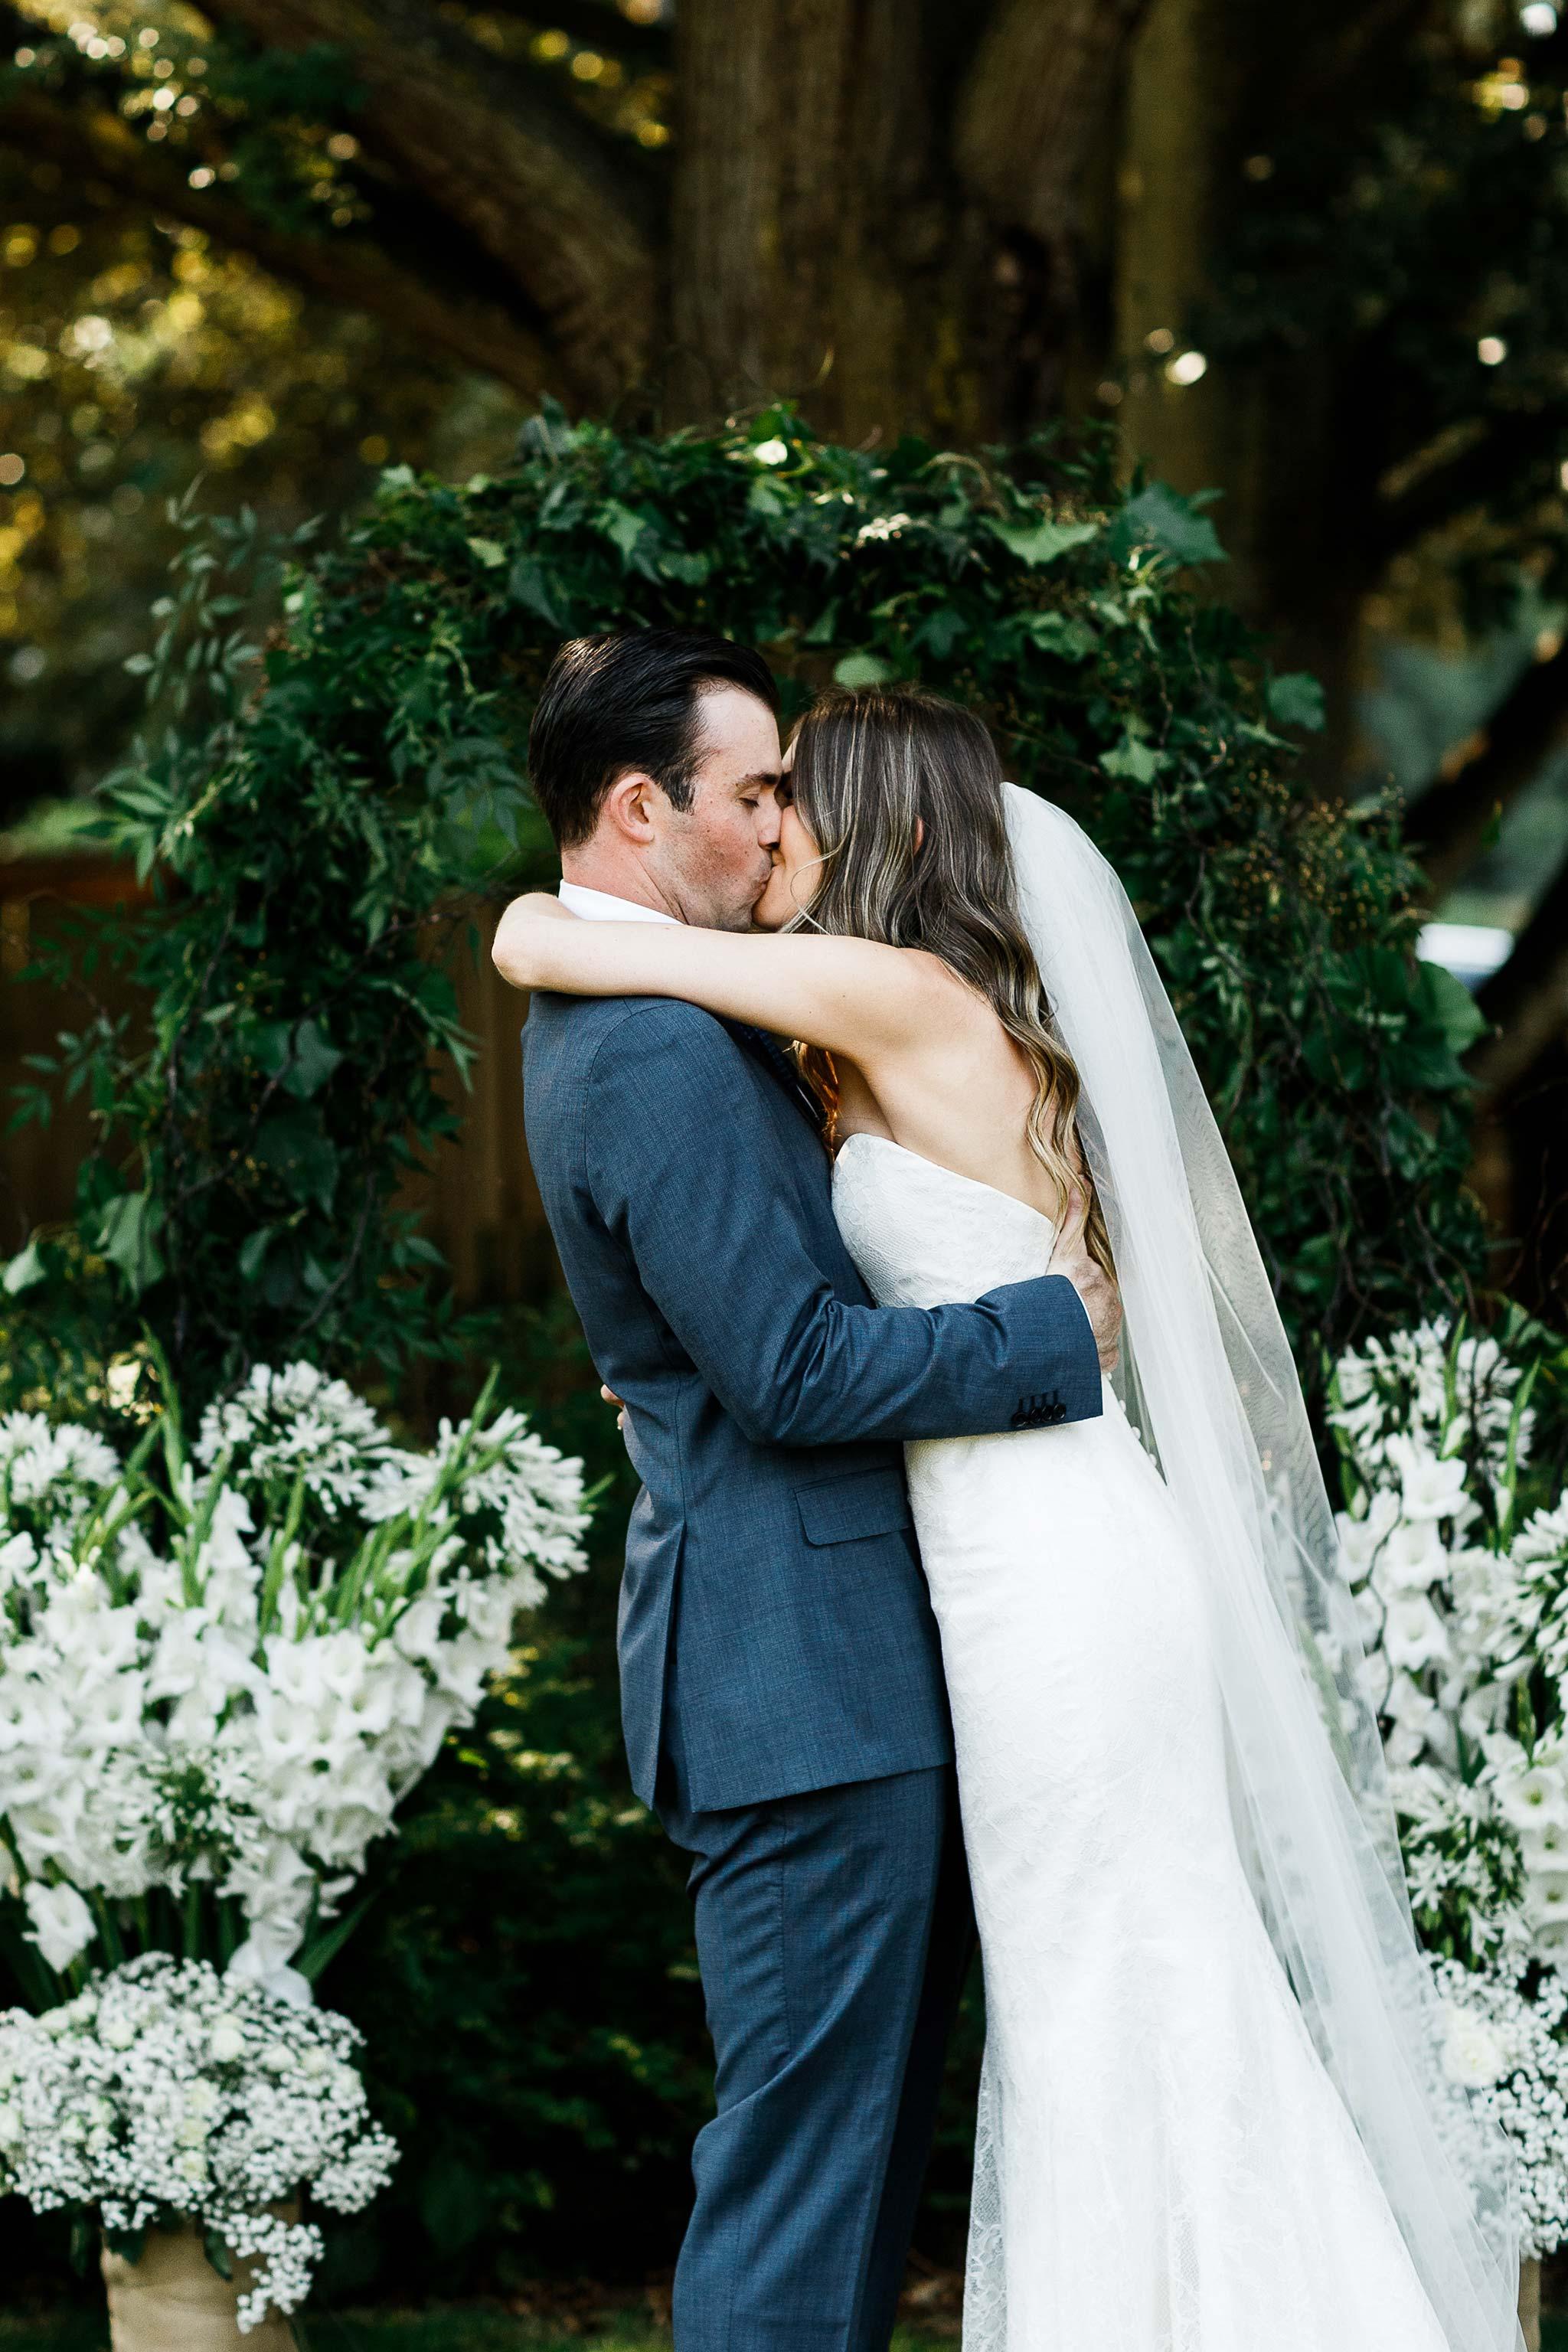 Launceston-Brickendon-Wedding-Photographer-ceremony-kiss